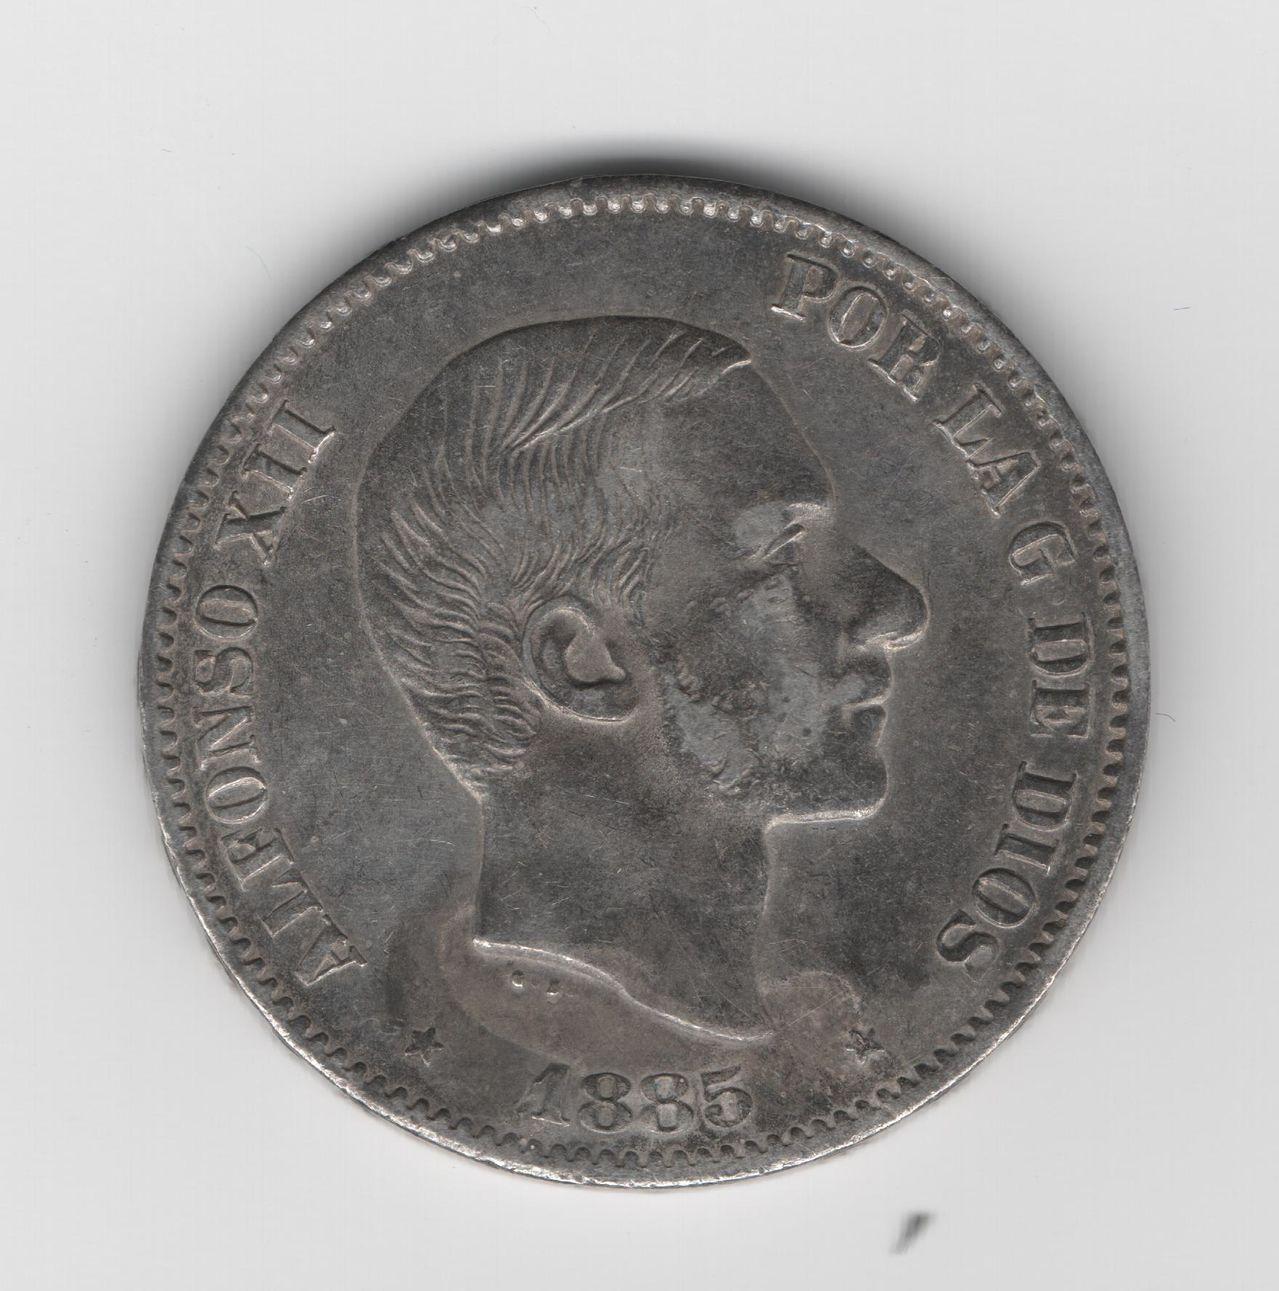 50 Centavos de peso 1885 Alfonso XII - Manila 50_Ctv_Peso_1885_Manila